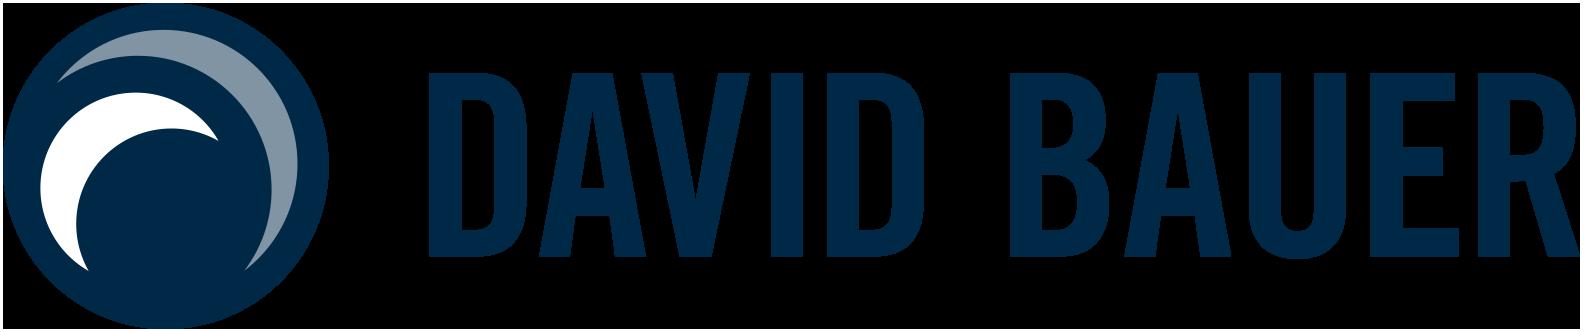 david bauer - portfolio